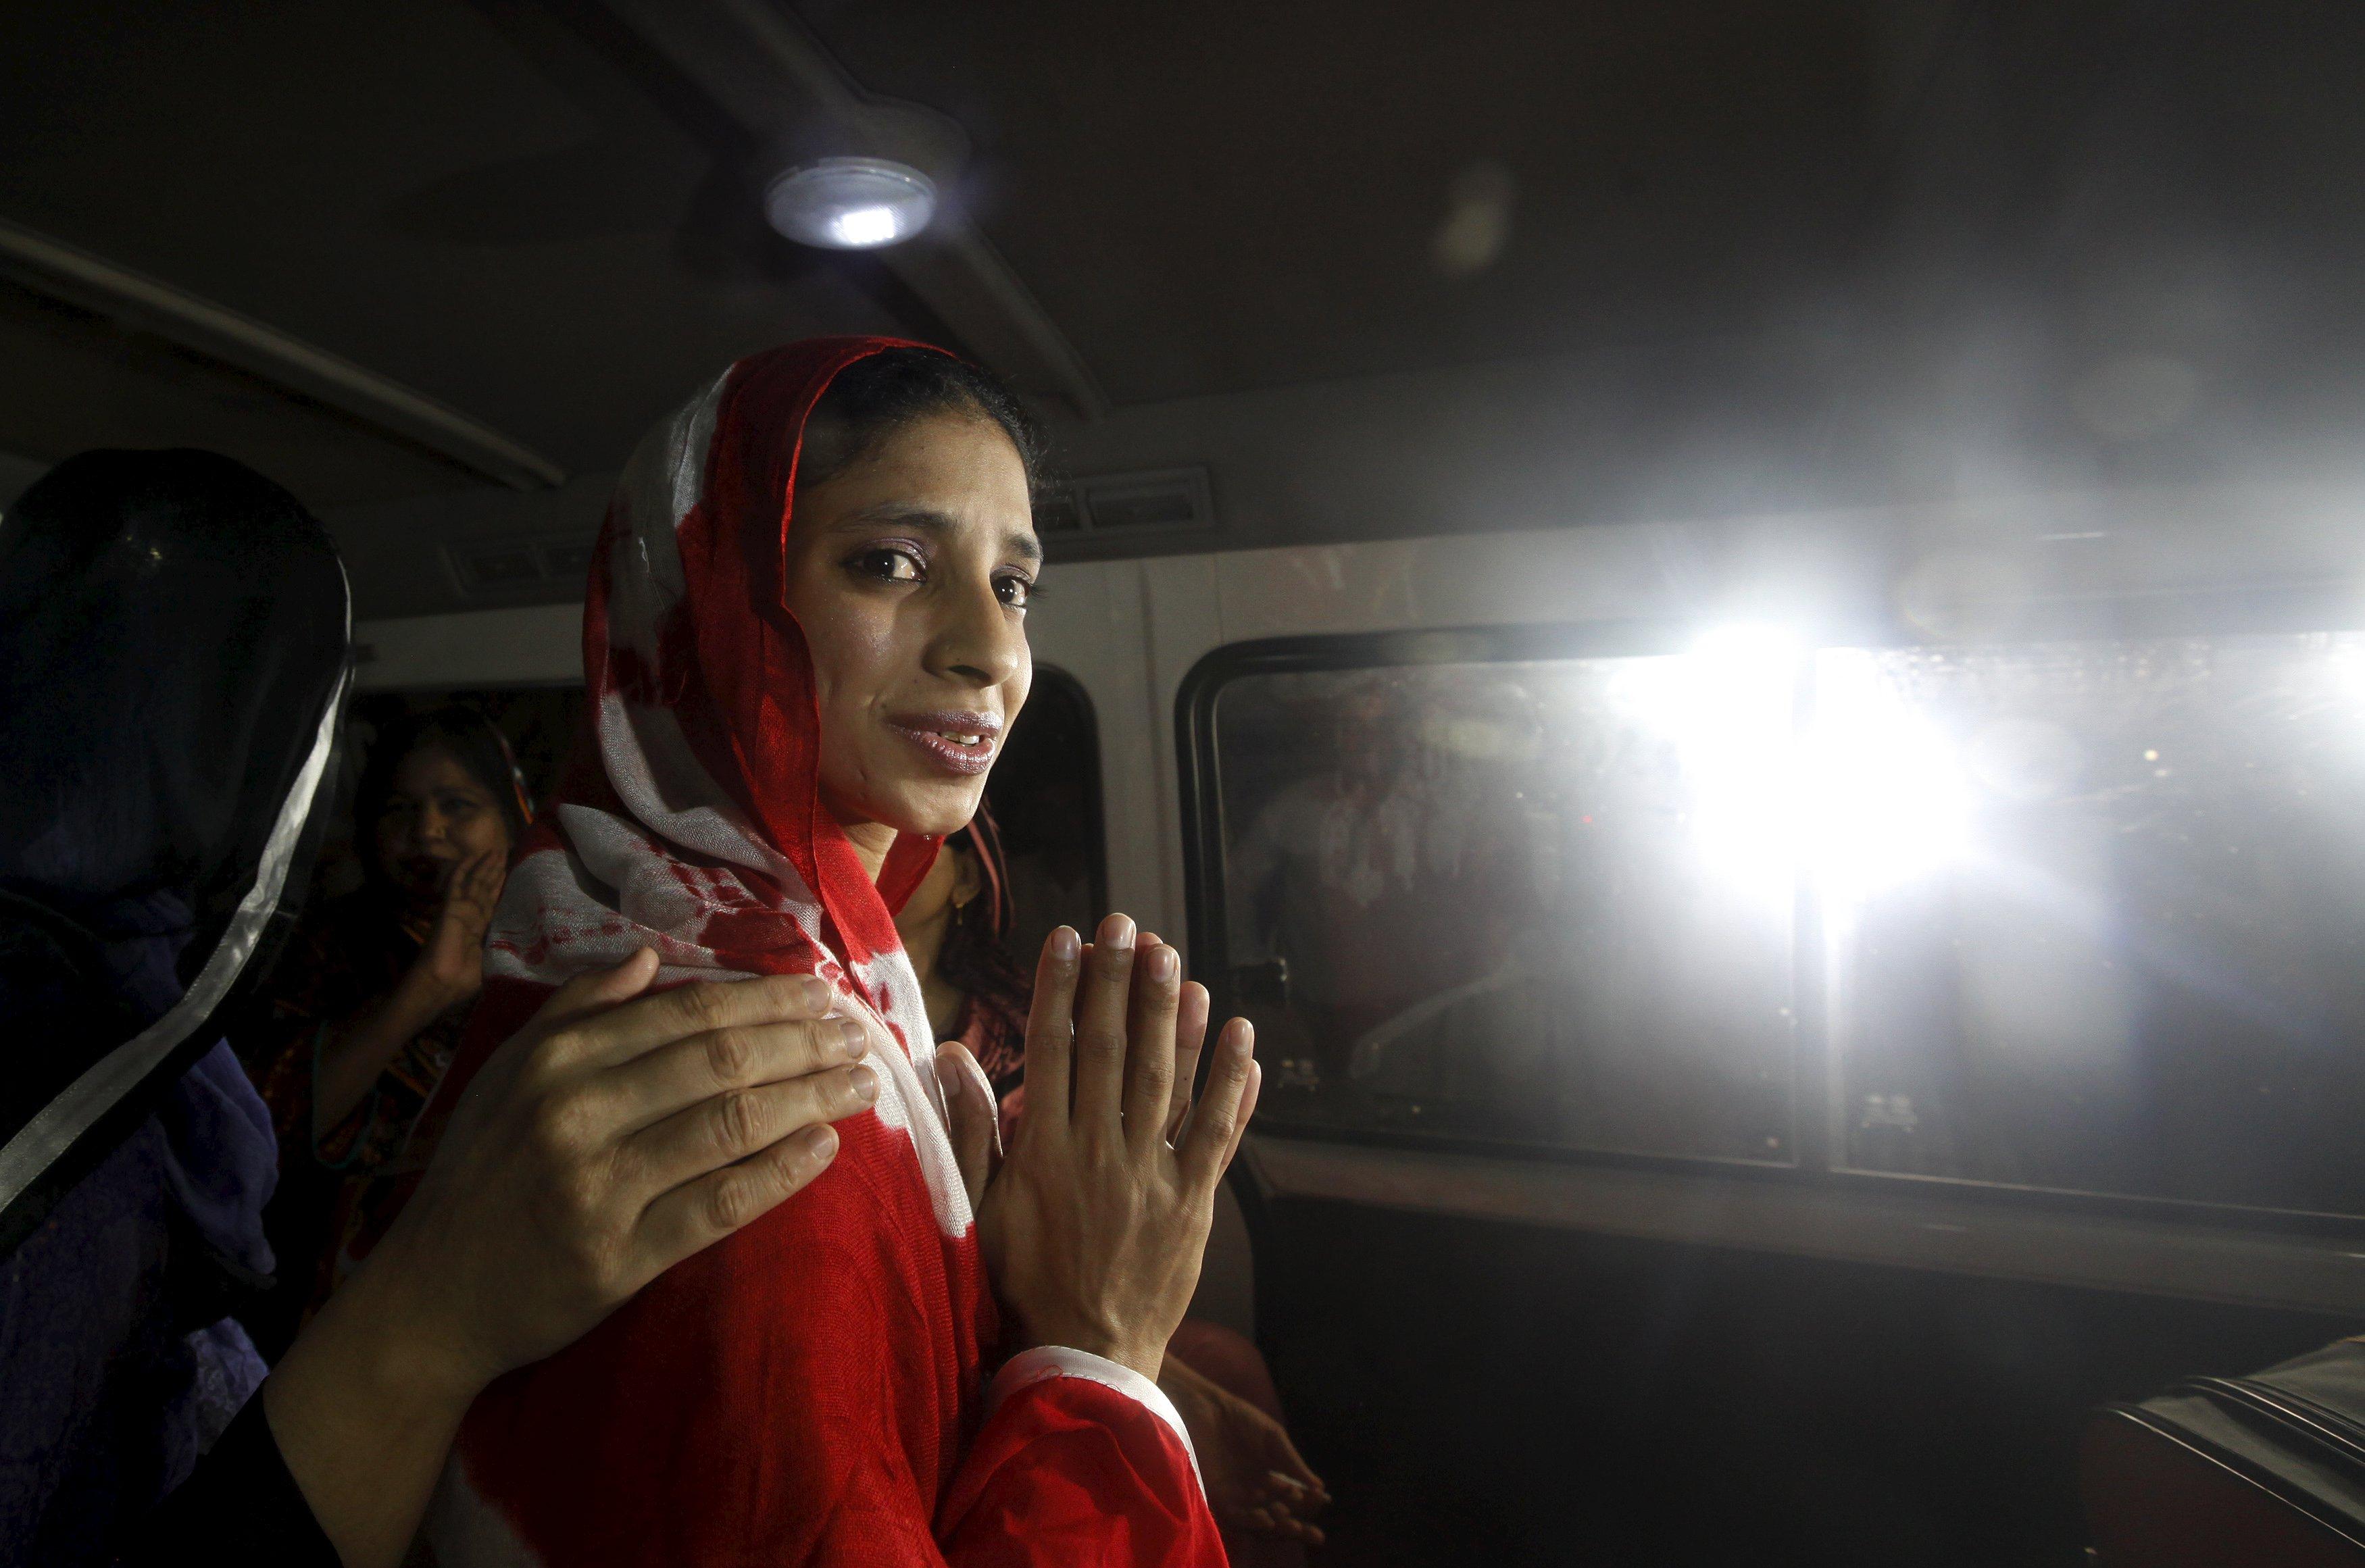 Geeta menangkupkan tangannya saat ia melihat keluar van saat pergi ke bandara untuk berangkat ke New Delhi, di luar Yayasan Edhi di Karachi, Pakistan, Senin (26/10). Geeta, seorang perempuan Hindu tuna rungu yang berusia 20-an tahun, masih sekitar berumur 11 tahun saat ia tidak sengaja menyeberangi perbatasan India ke Pakistan dan kehilangan keluarganya. Selama di Pakistan, Geeta hidup sebagai anak buangan, menurut petugas yayasan. Pencarian panjang terhadap keluarganya telah menarik perhatian publik setelah sebuah film populer dengan cerita yang mirip ditayangkan, dan pengadilan Pakistan mengatakan bahwa kedua negara harus menyelesaikan masalah ini secara diplomatis. REUTERS/Akhtar Soomro.